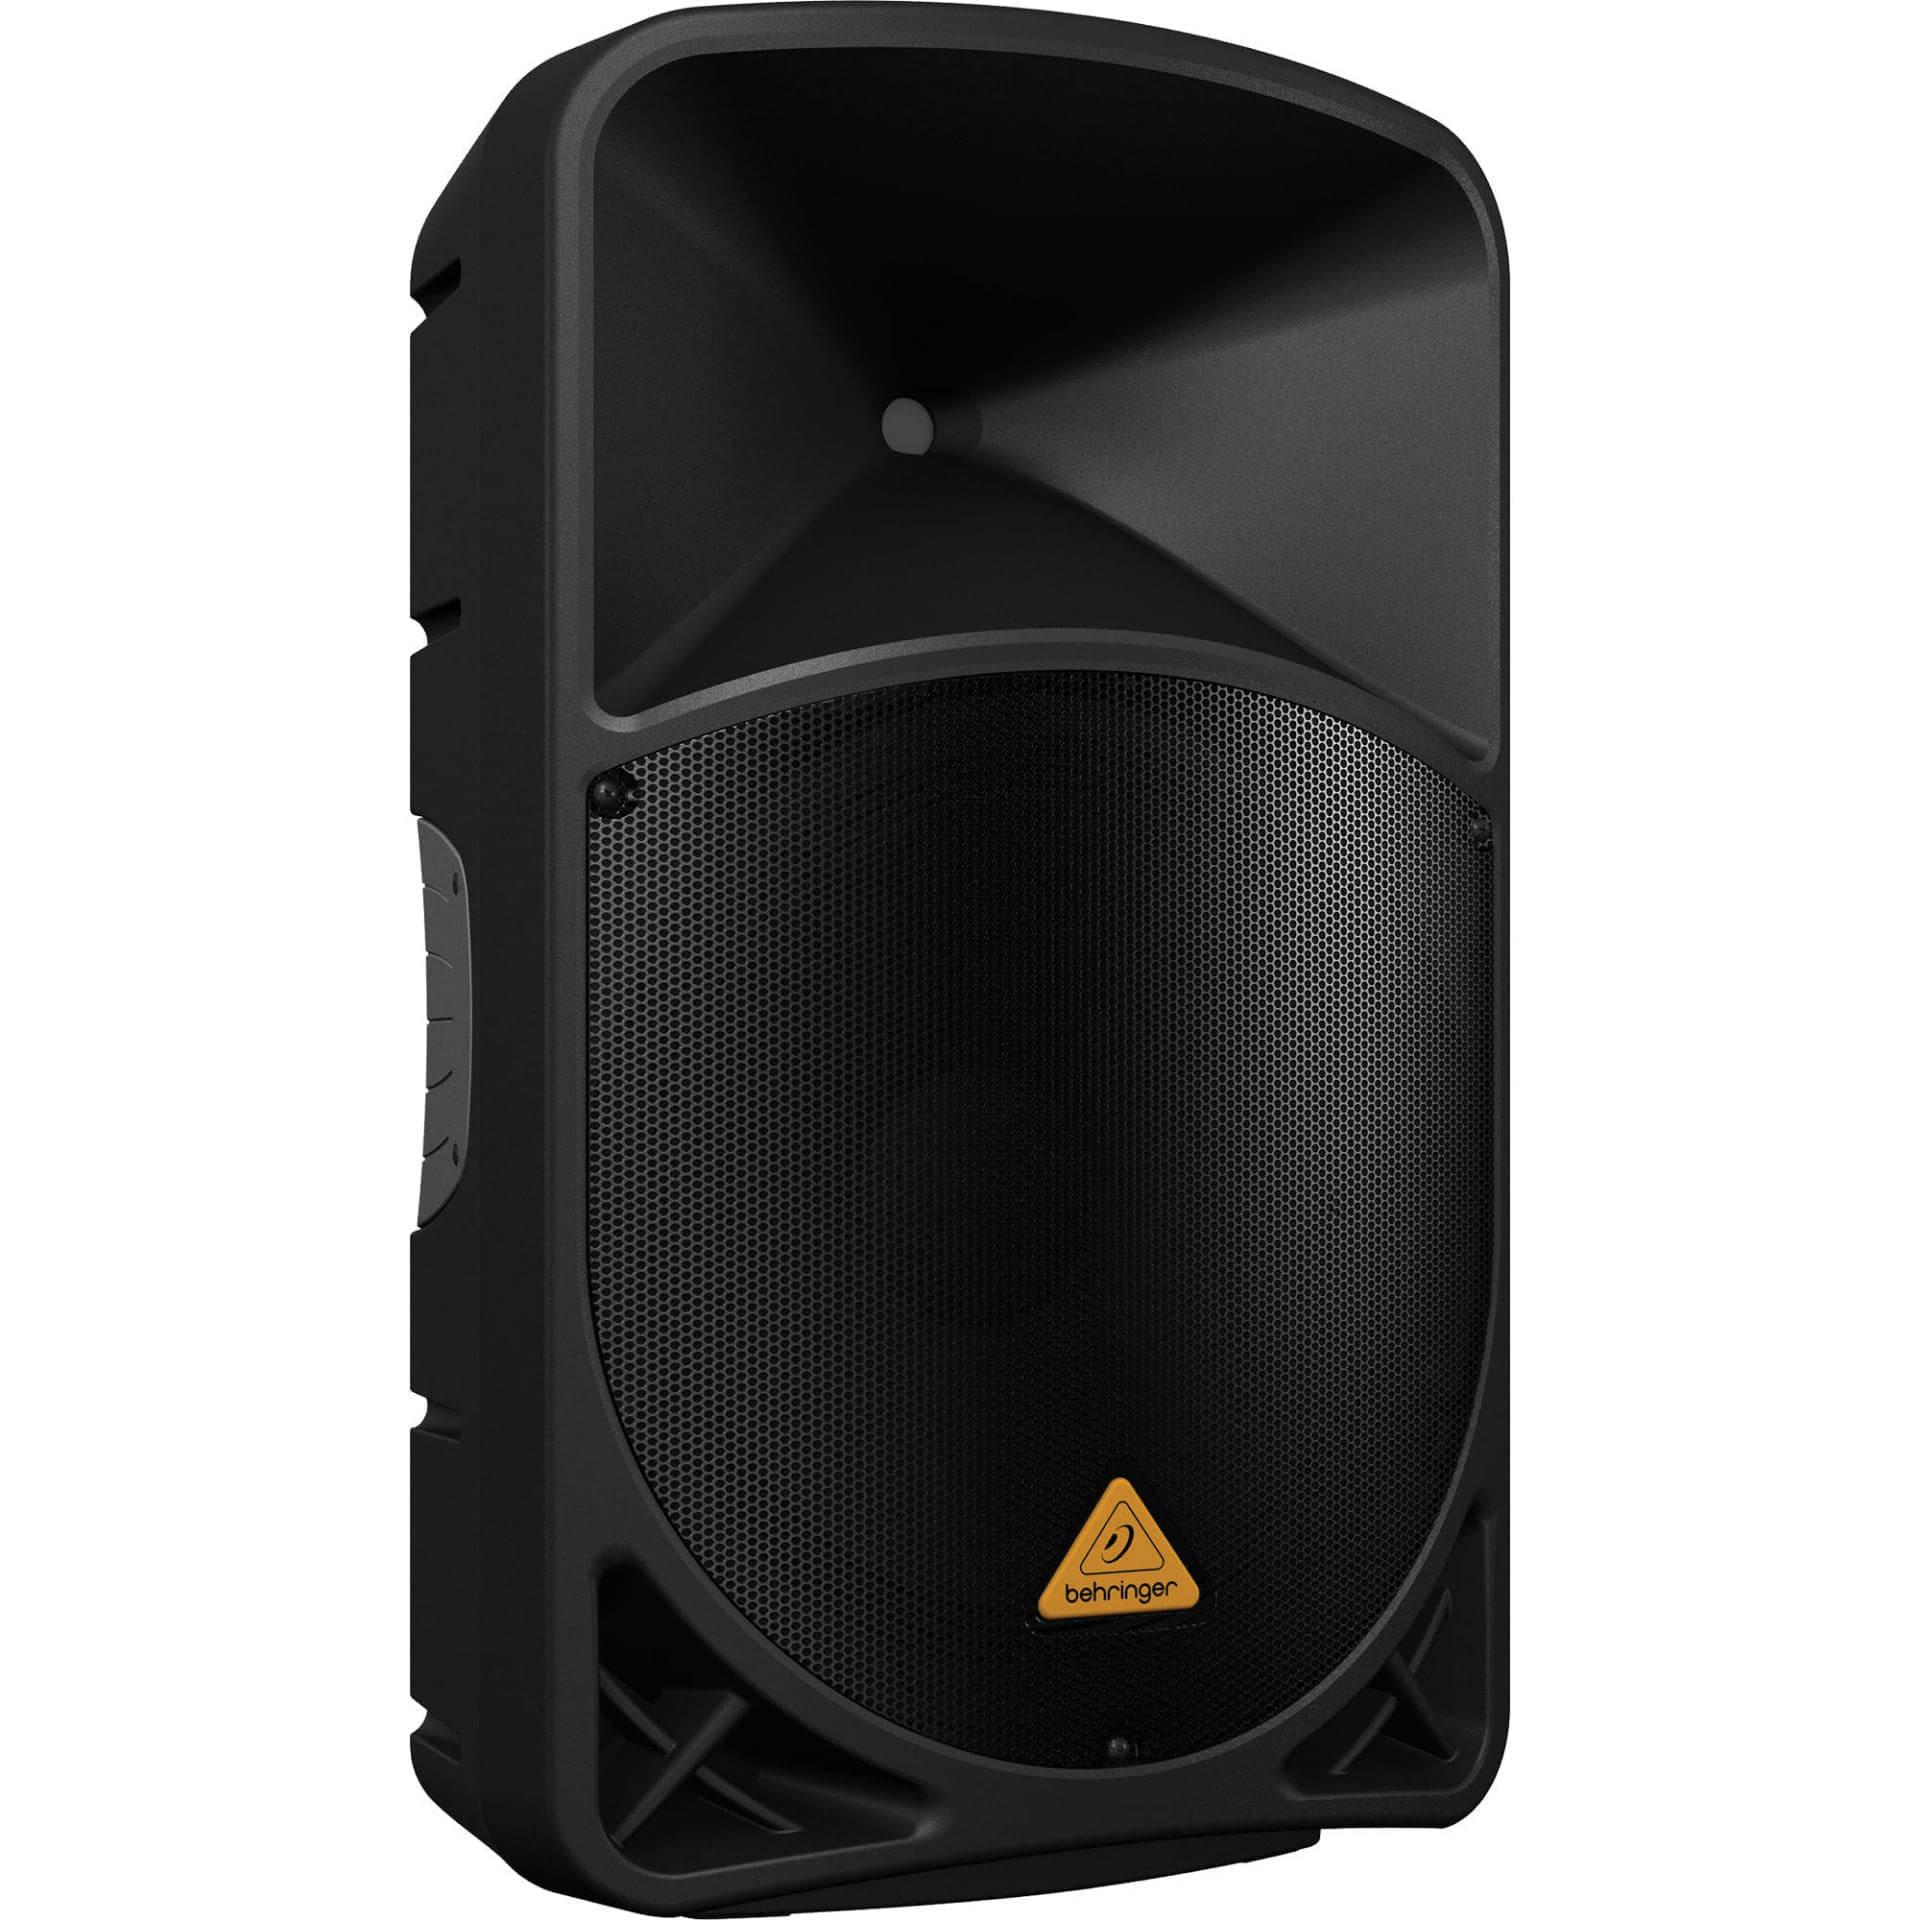 Audiophonic Hi-Fi Centre - Public Address Systems in Tarxien, Malta